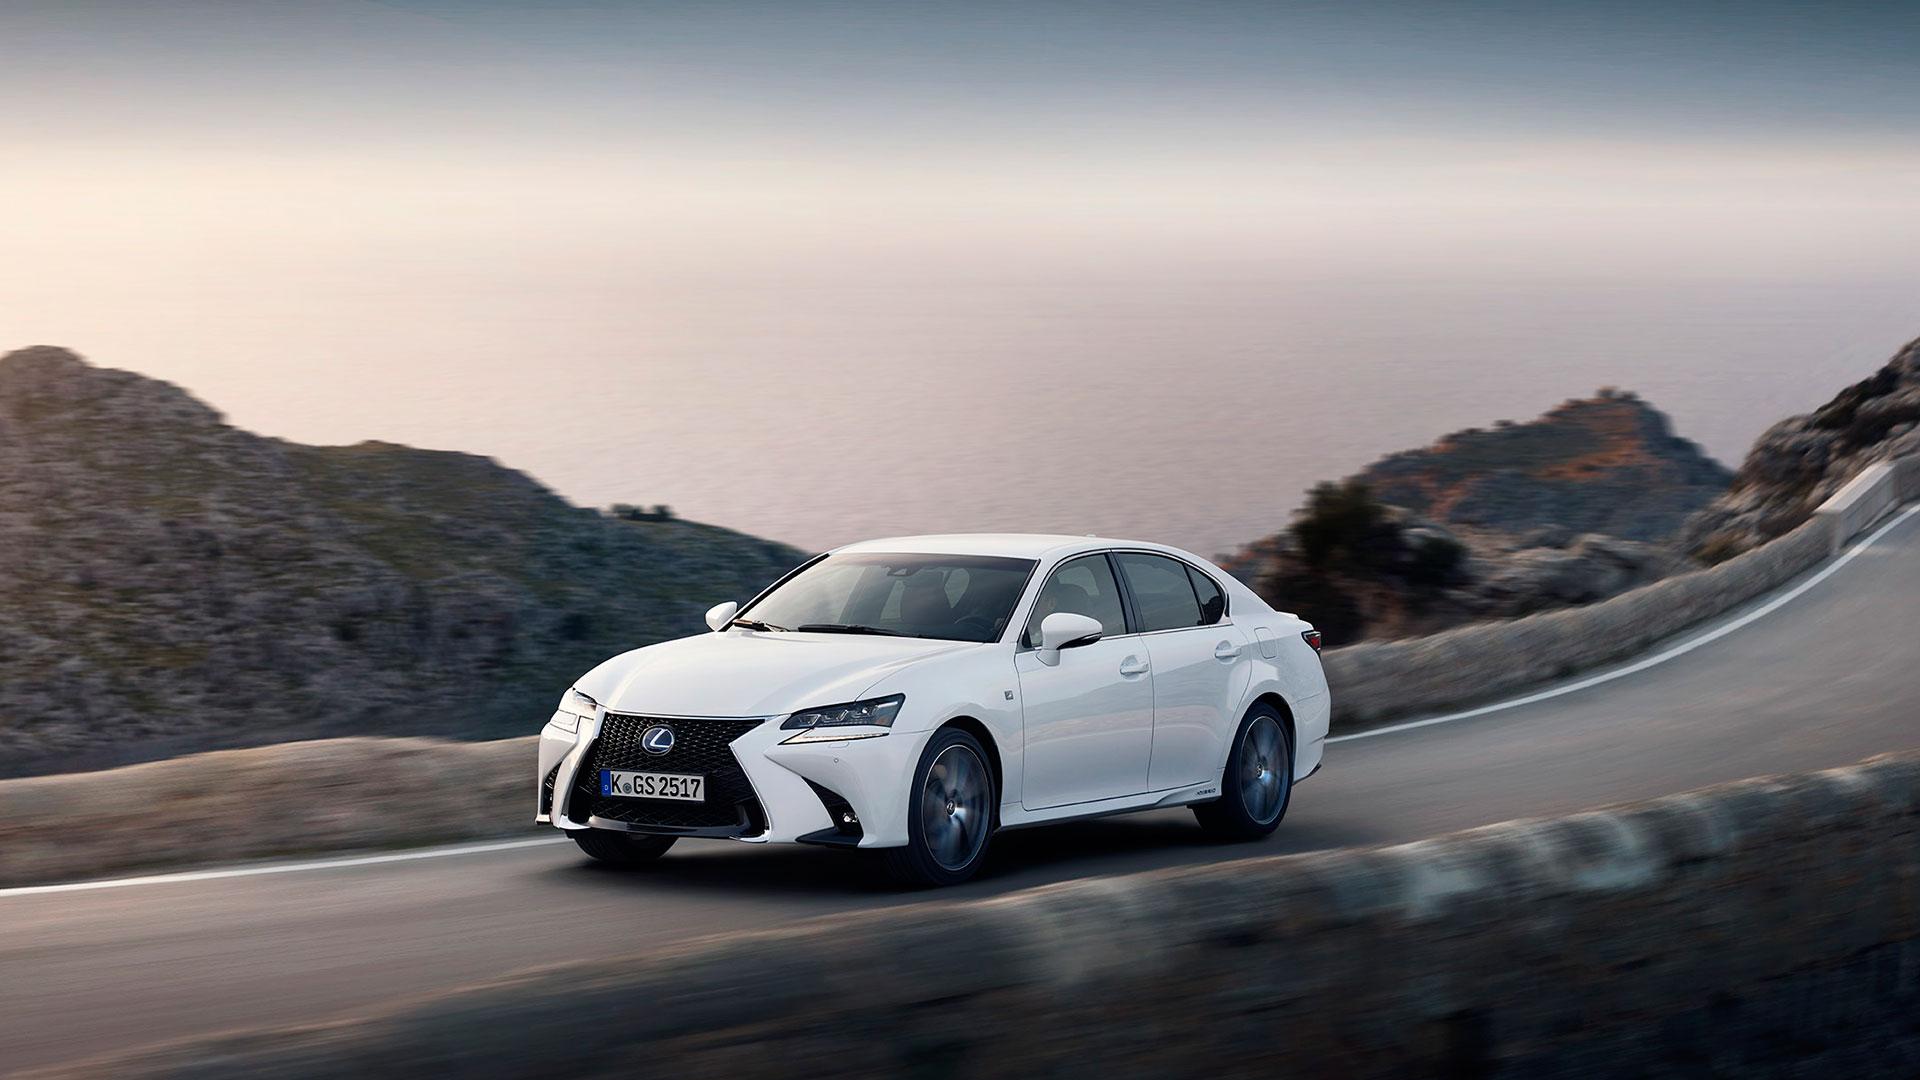 Lexus GS para una ejecutivo hero asset